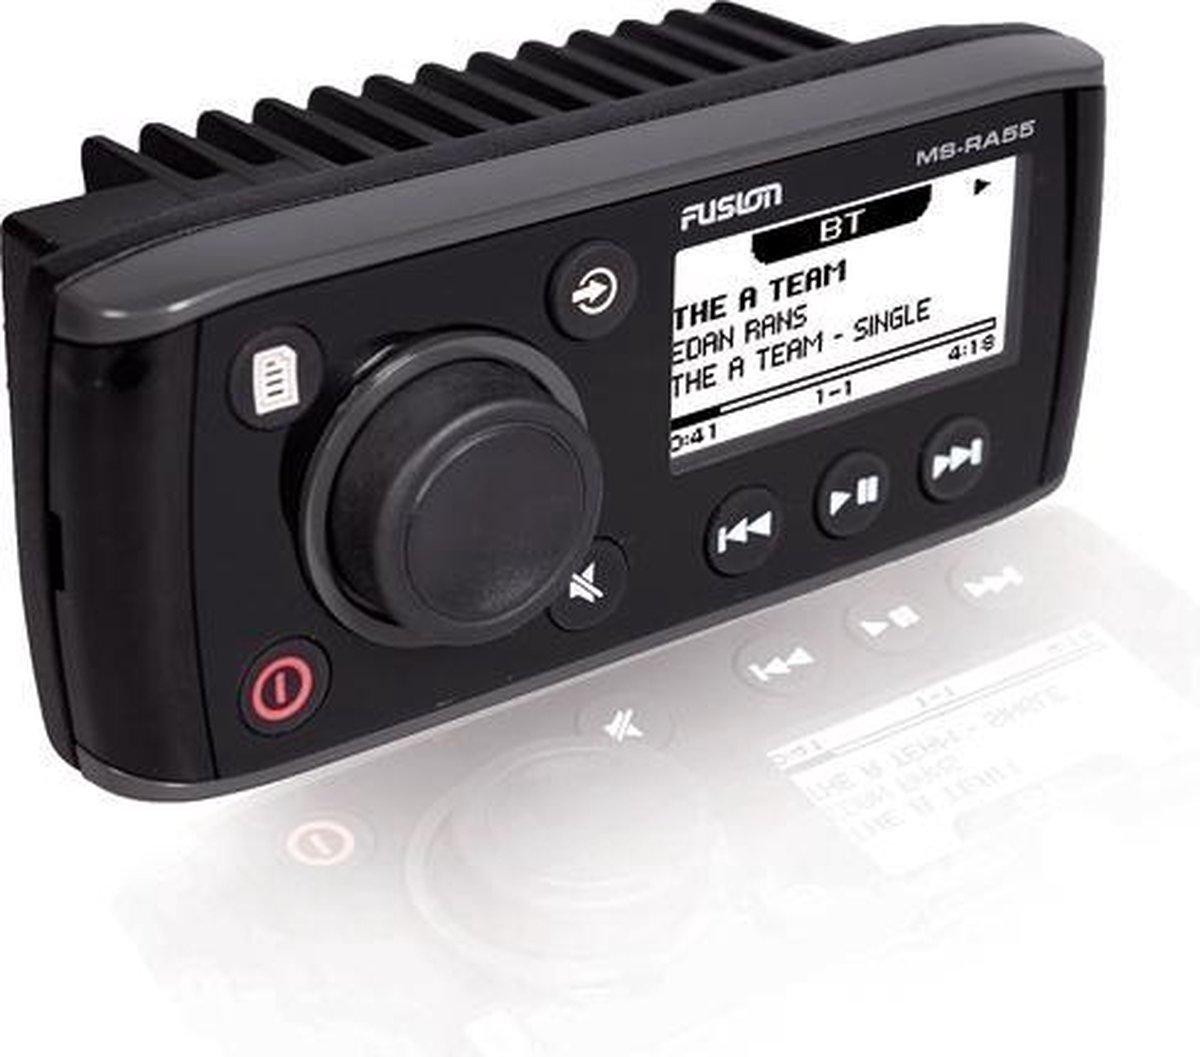 Fusion MS-RA55KTS Kit incl. MS-RA55 / MS-EL602 speakers